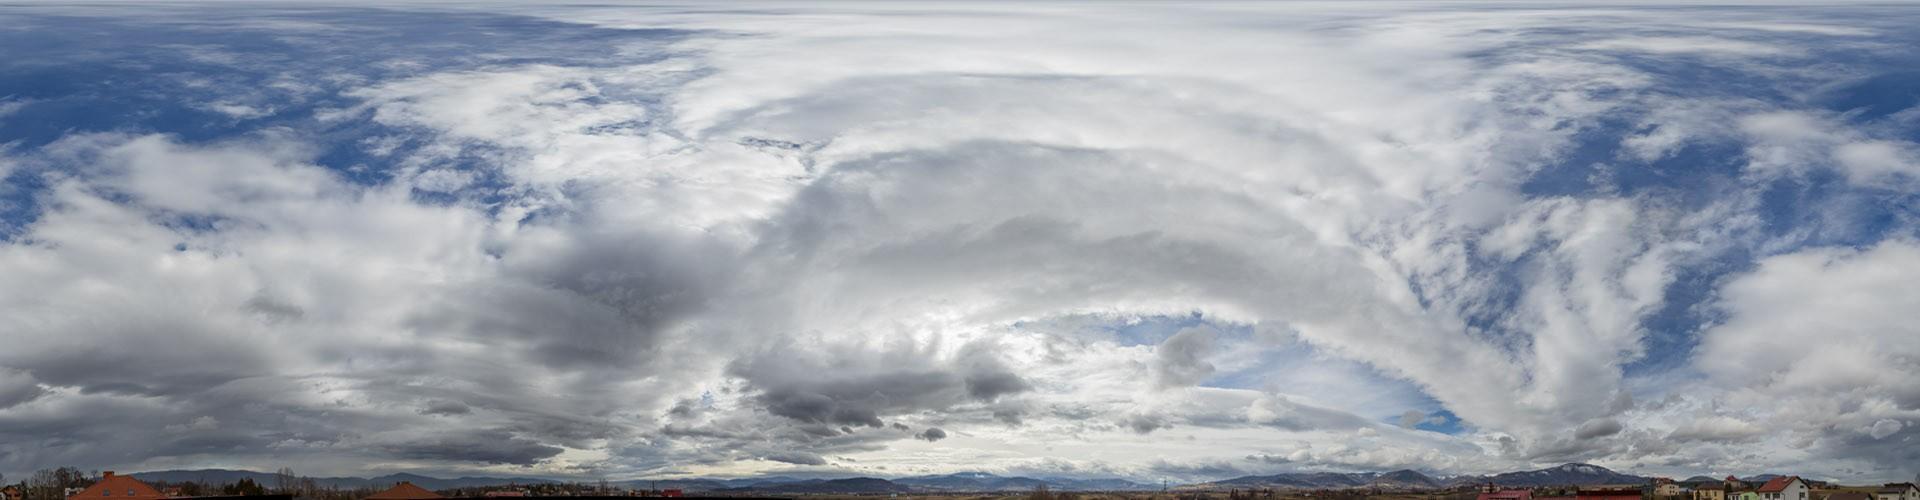 Cloudy Mountains 9179 (30k)